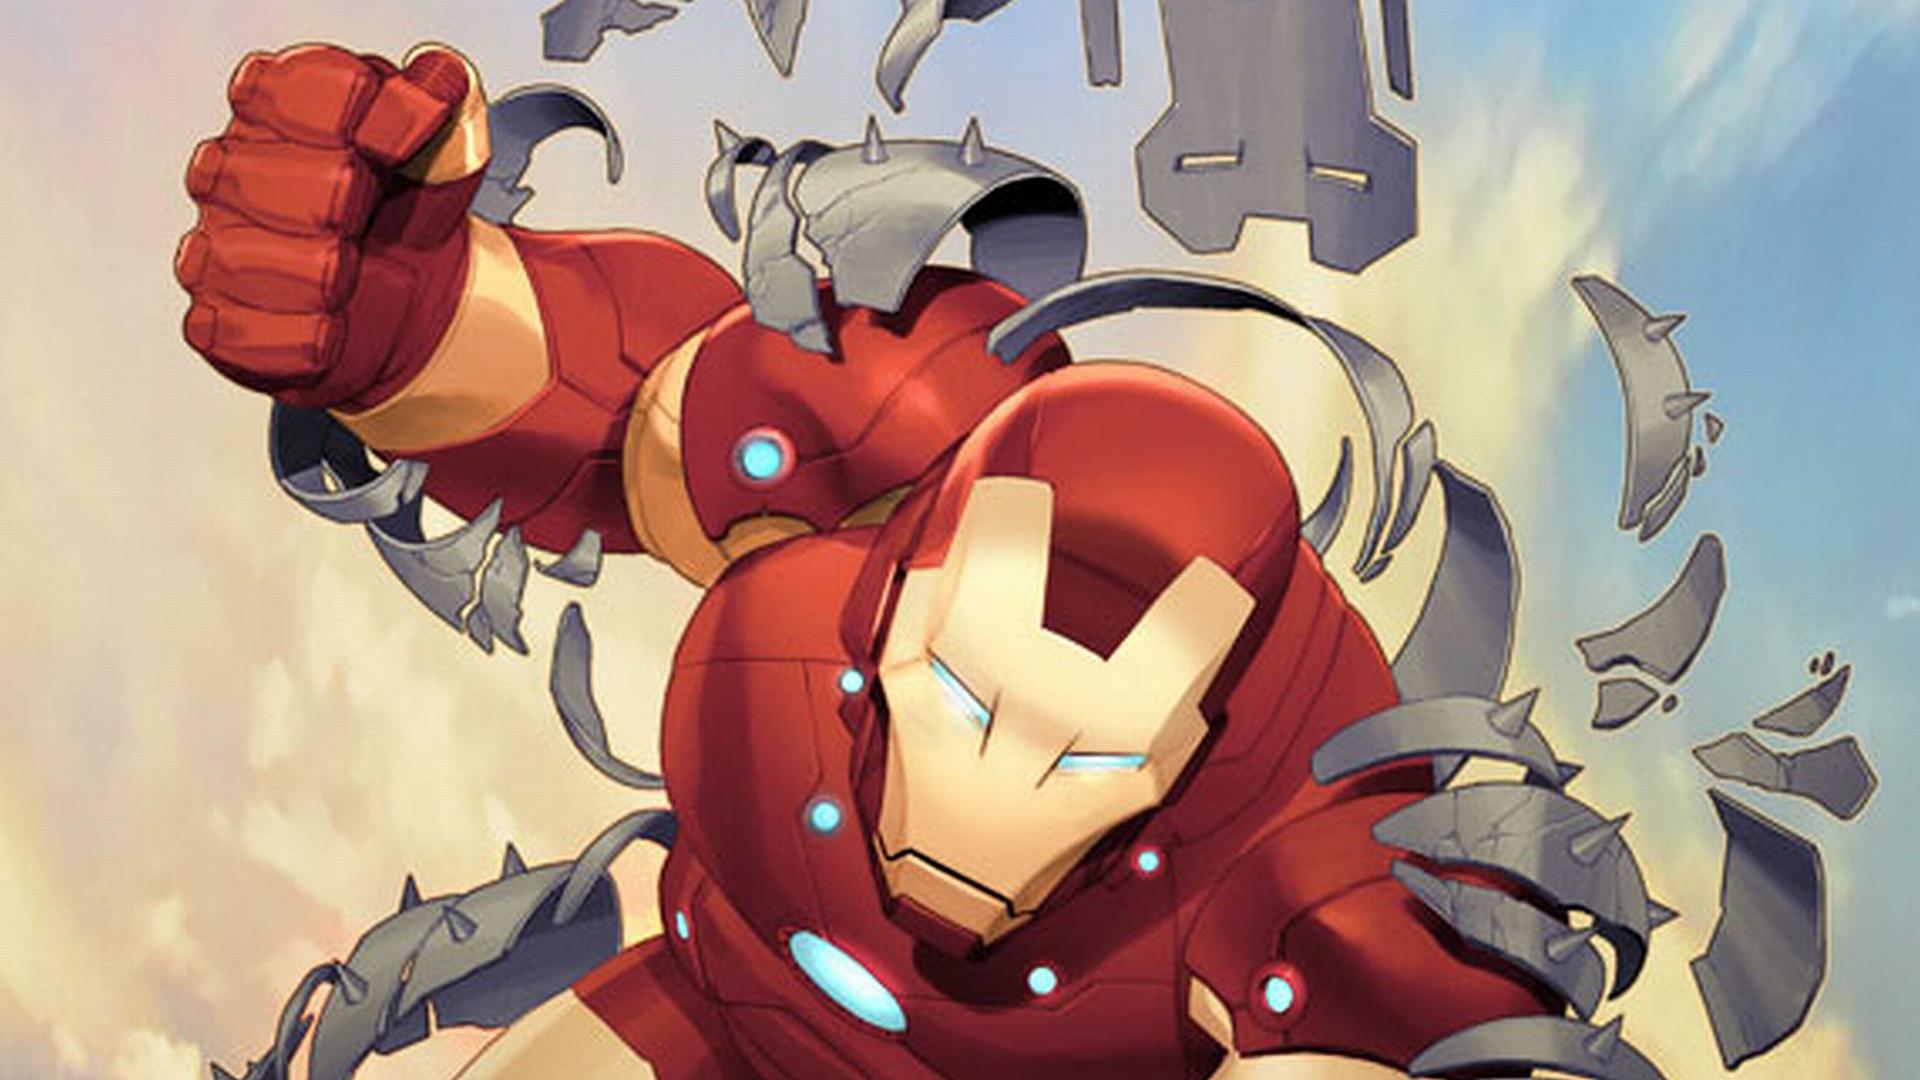 Iron Man Comic Wallpaper Full HD - Wickedsa com